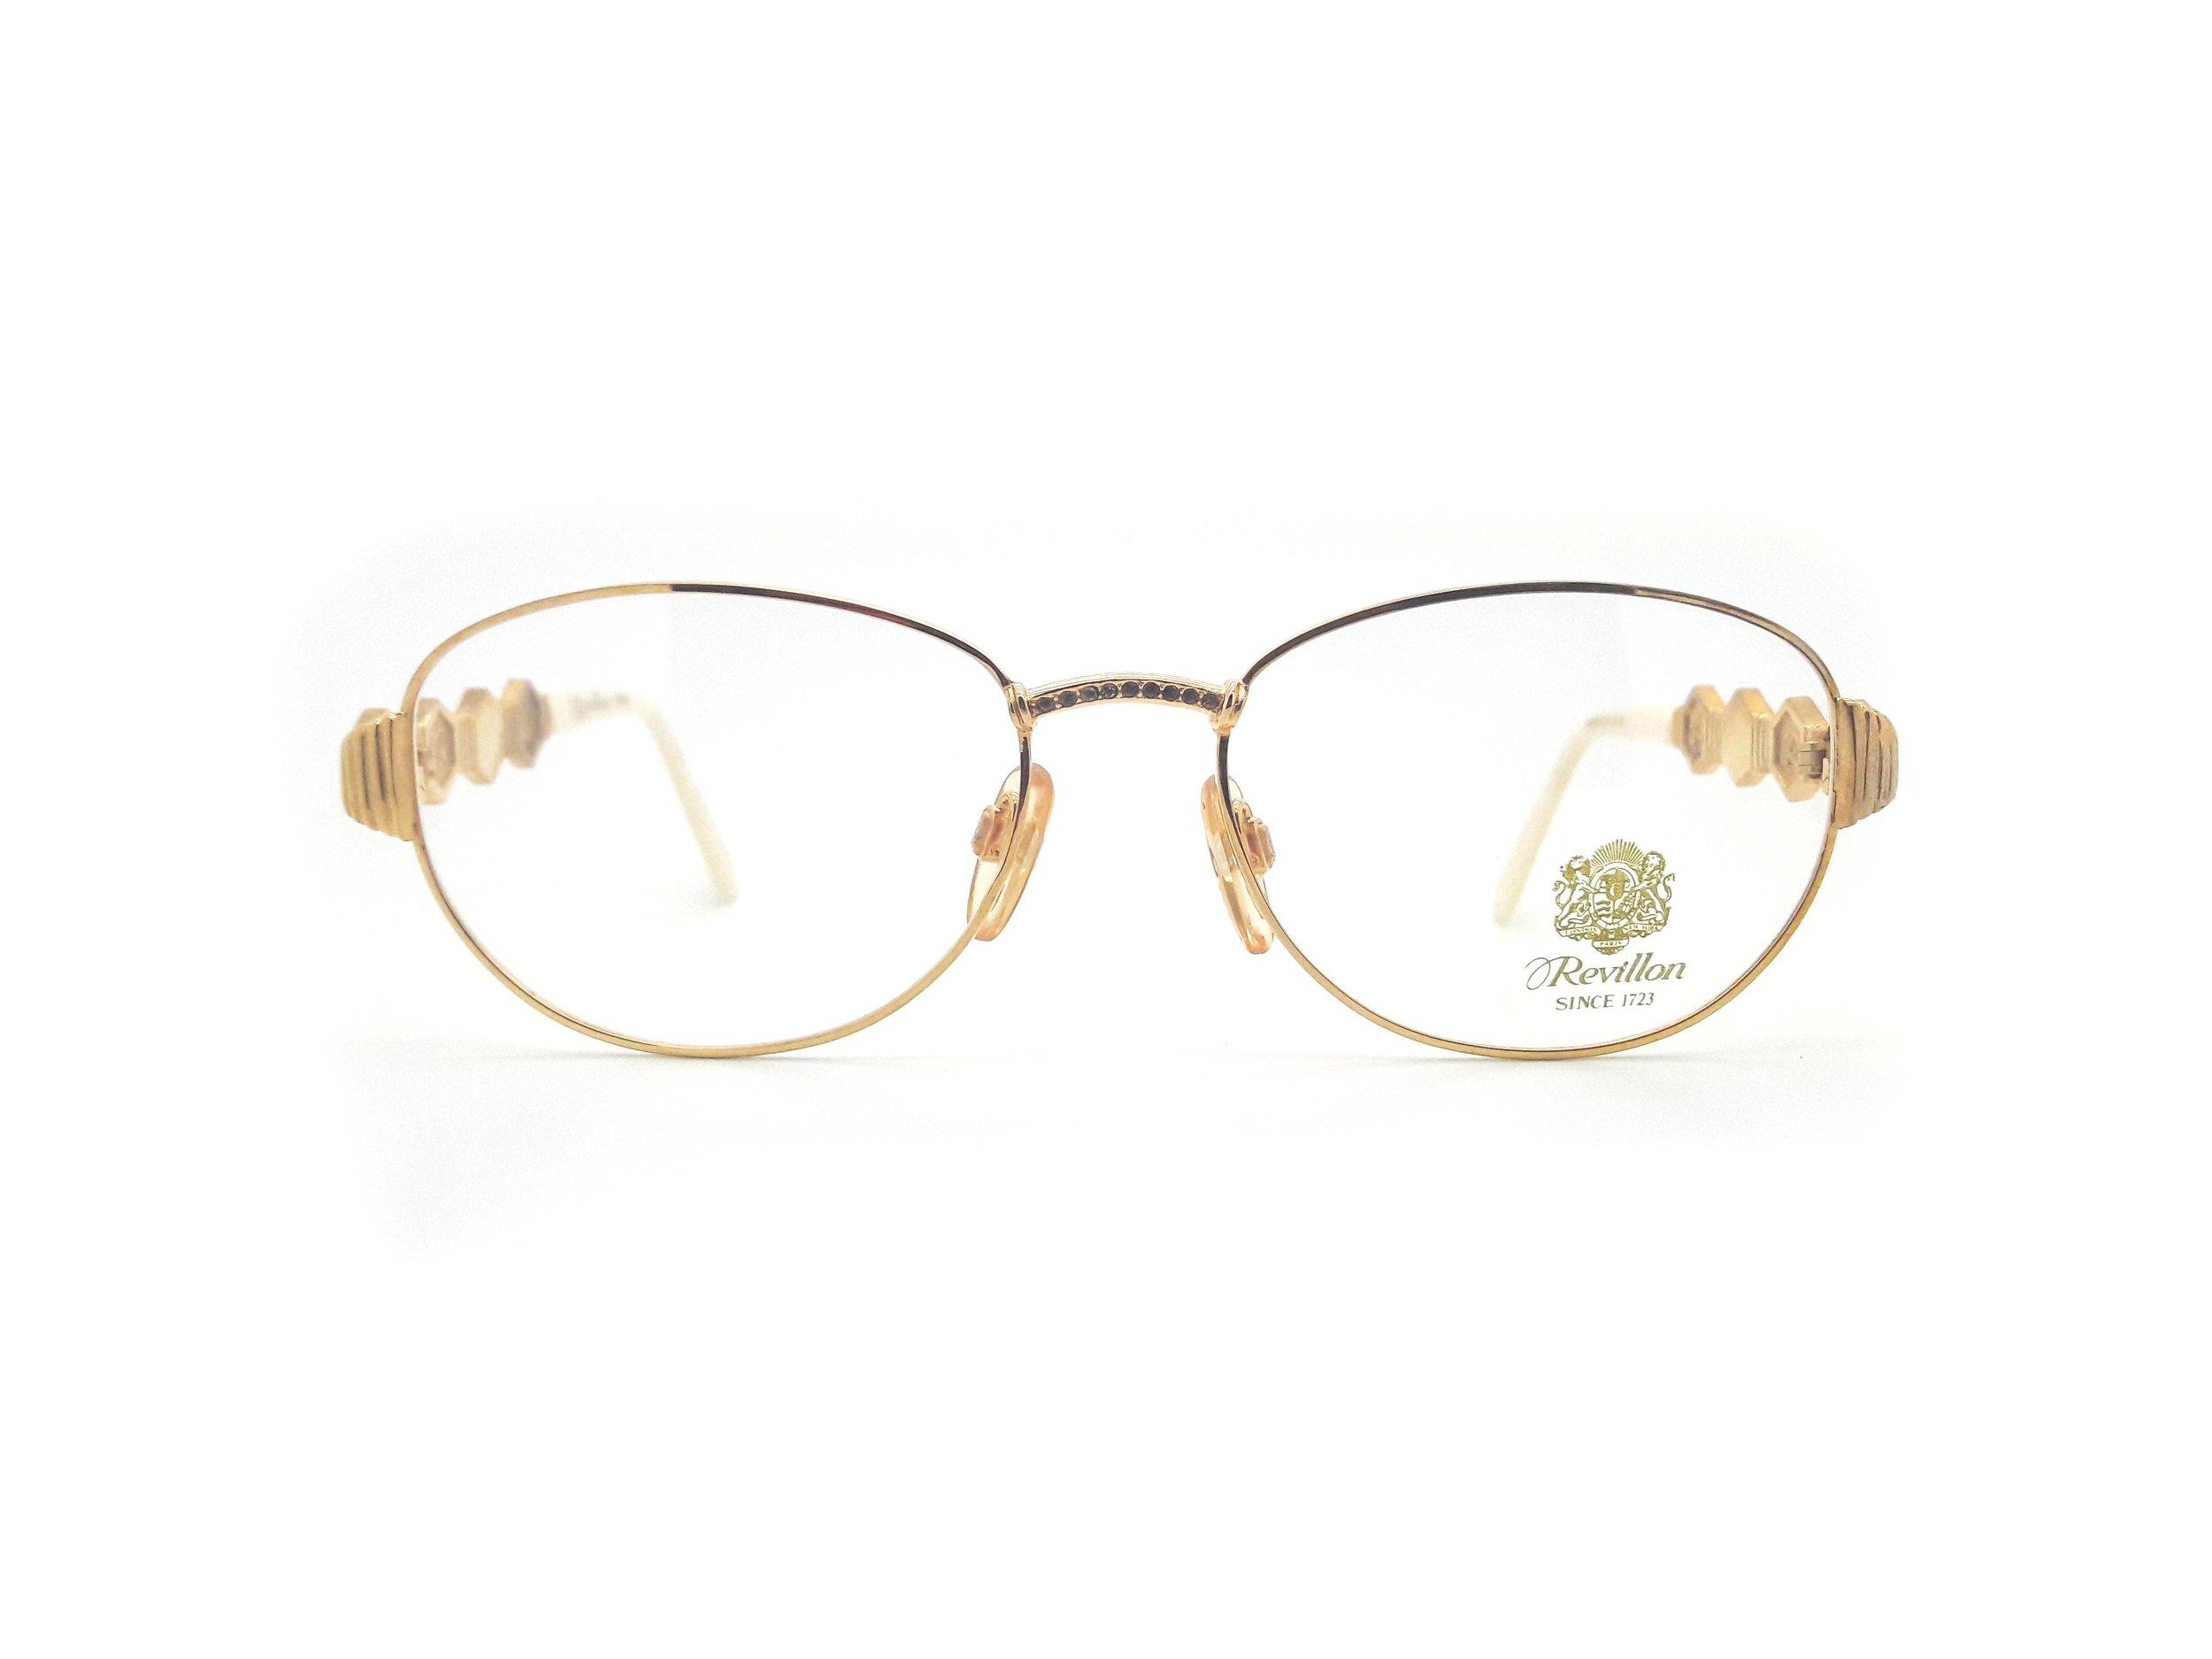 Revillon Paris — Ed & Sarna Vintage Eyewear